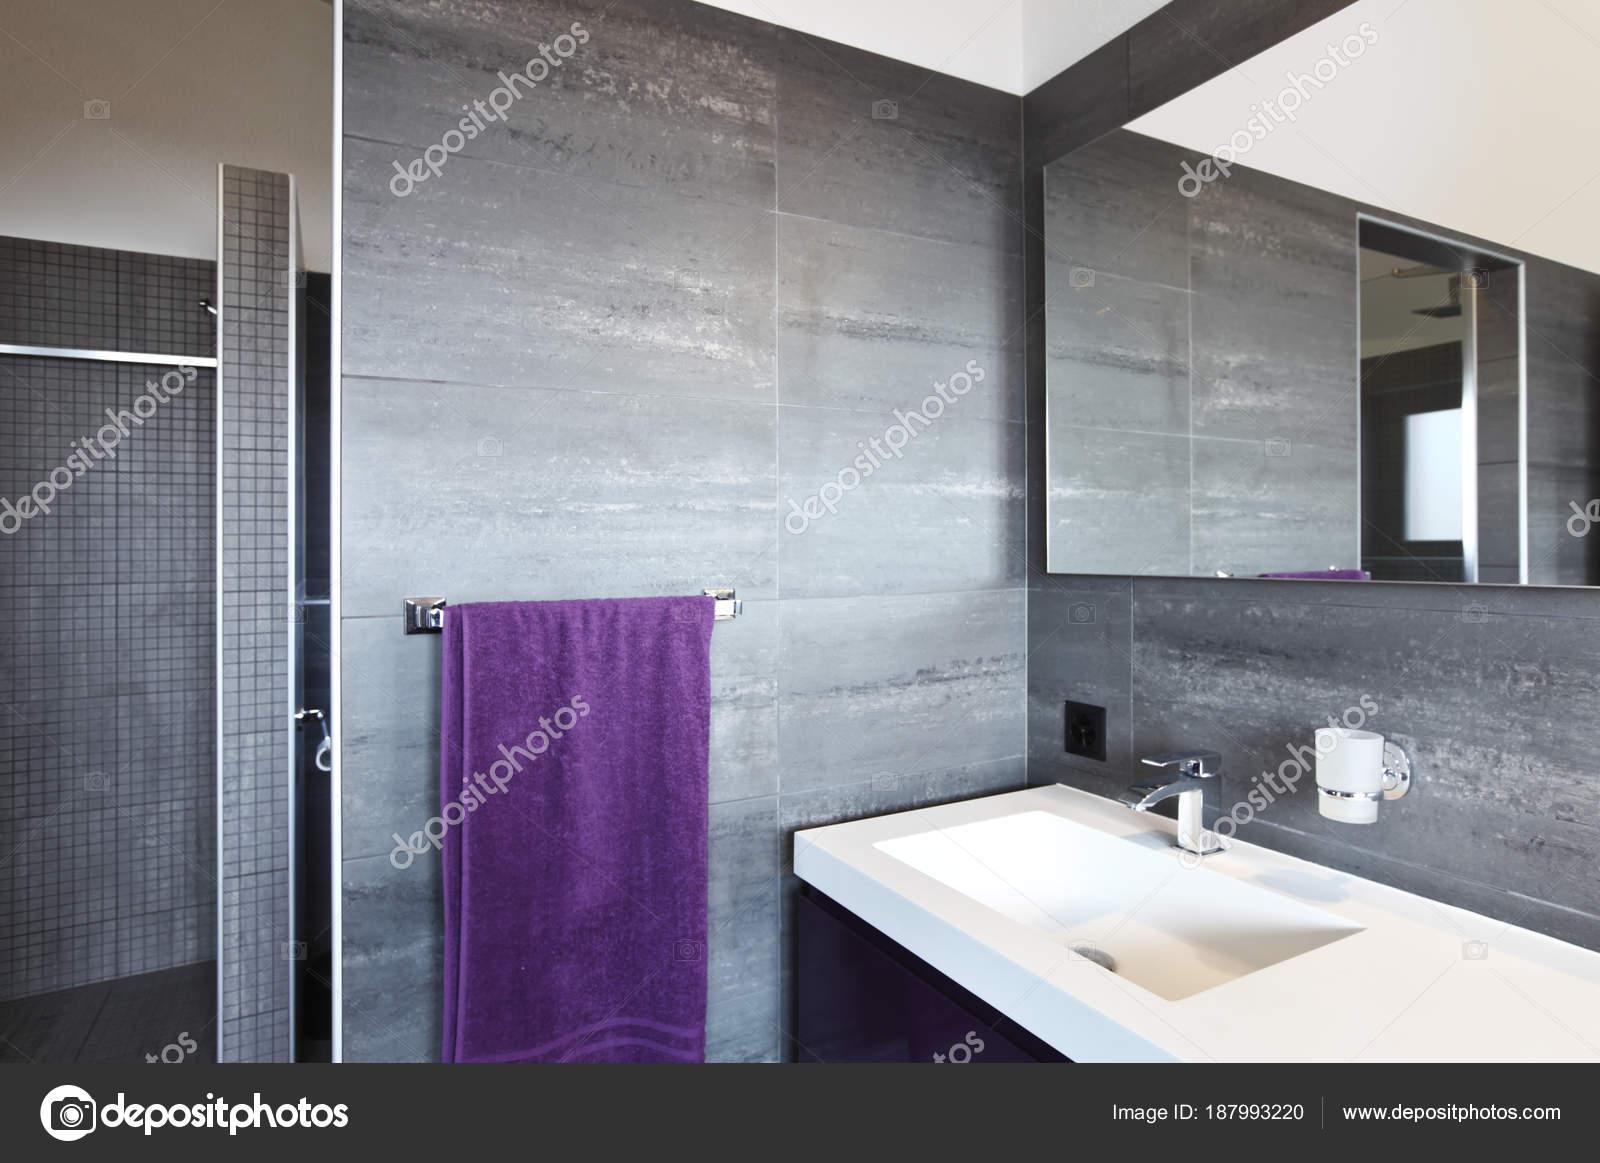 Badkamer Tegels Grijs : Badkamer met grijze tegels elegante en moderne u stockfoto